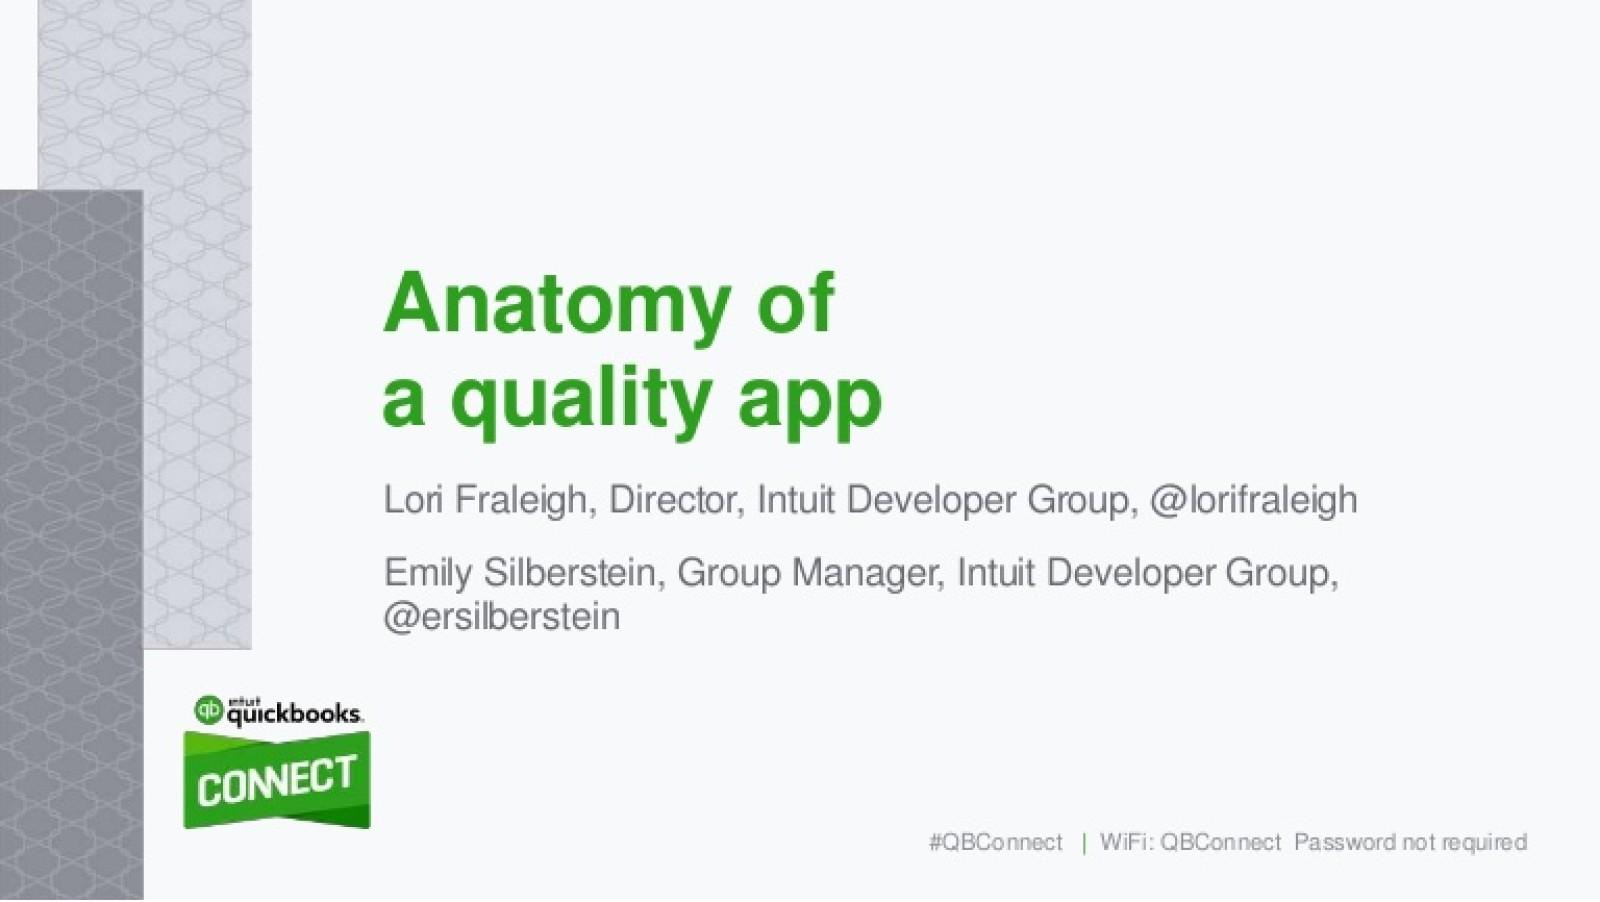 Anatomy of a Quality App